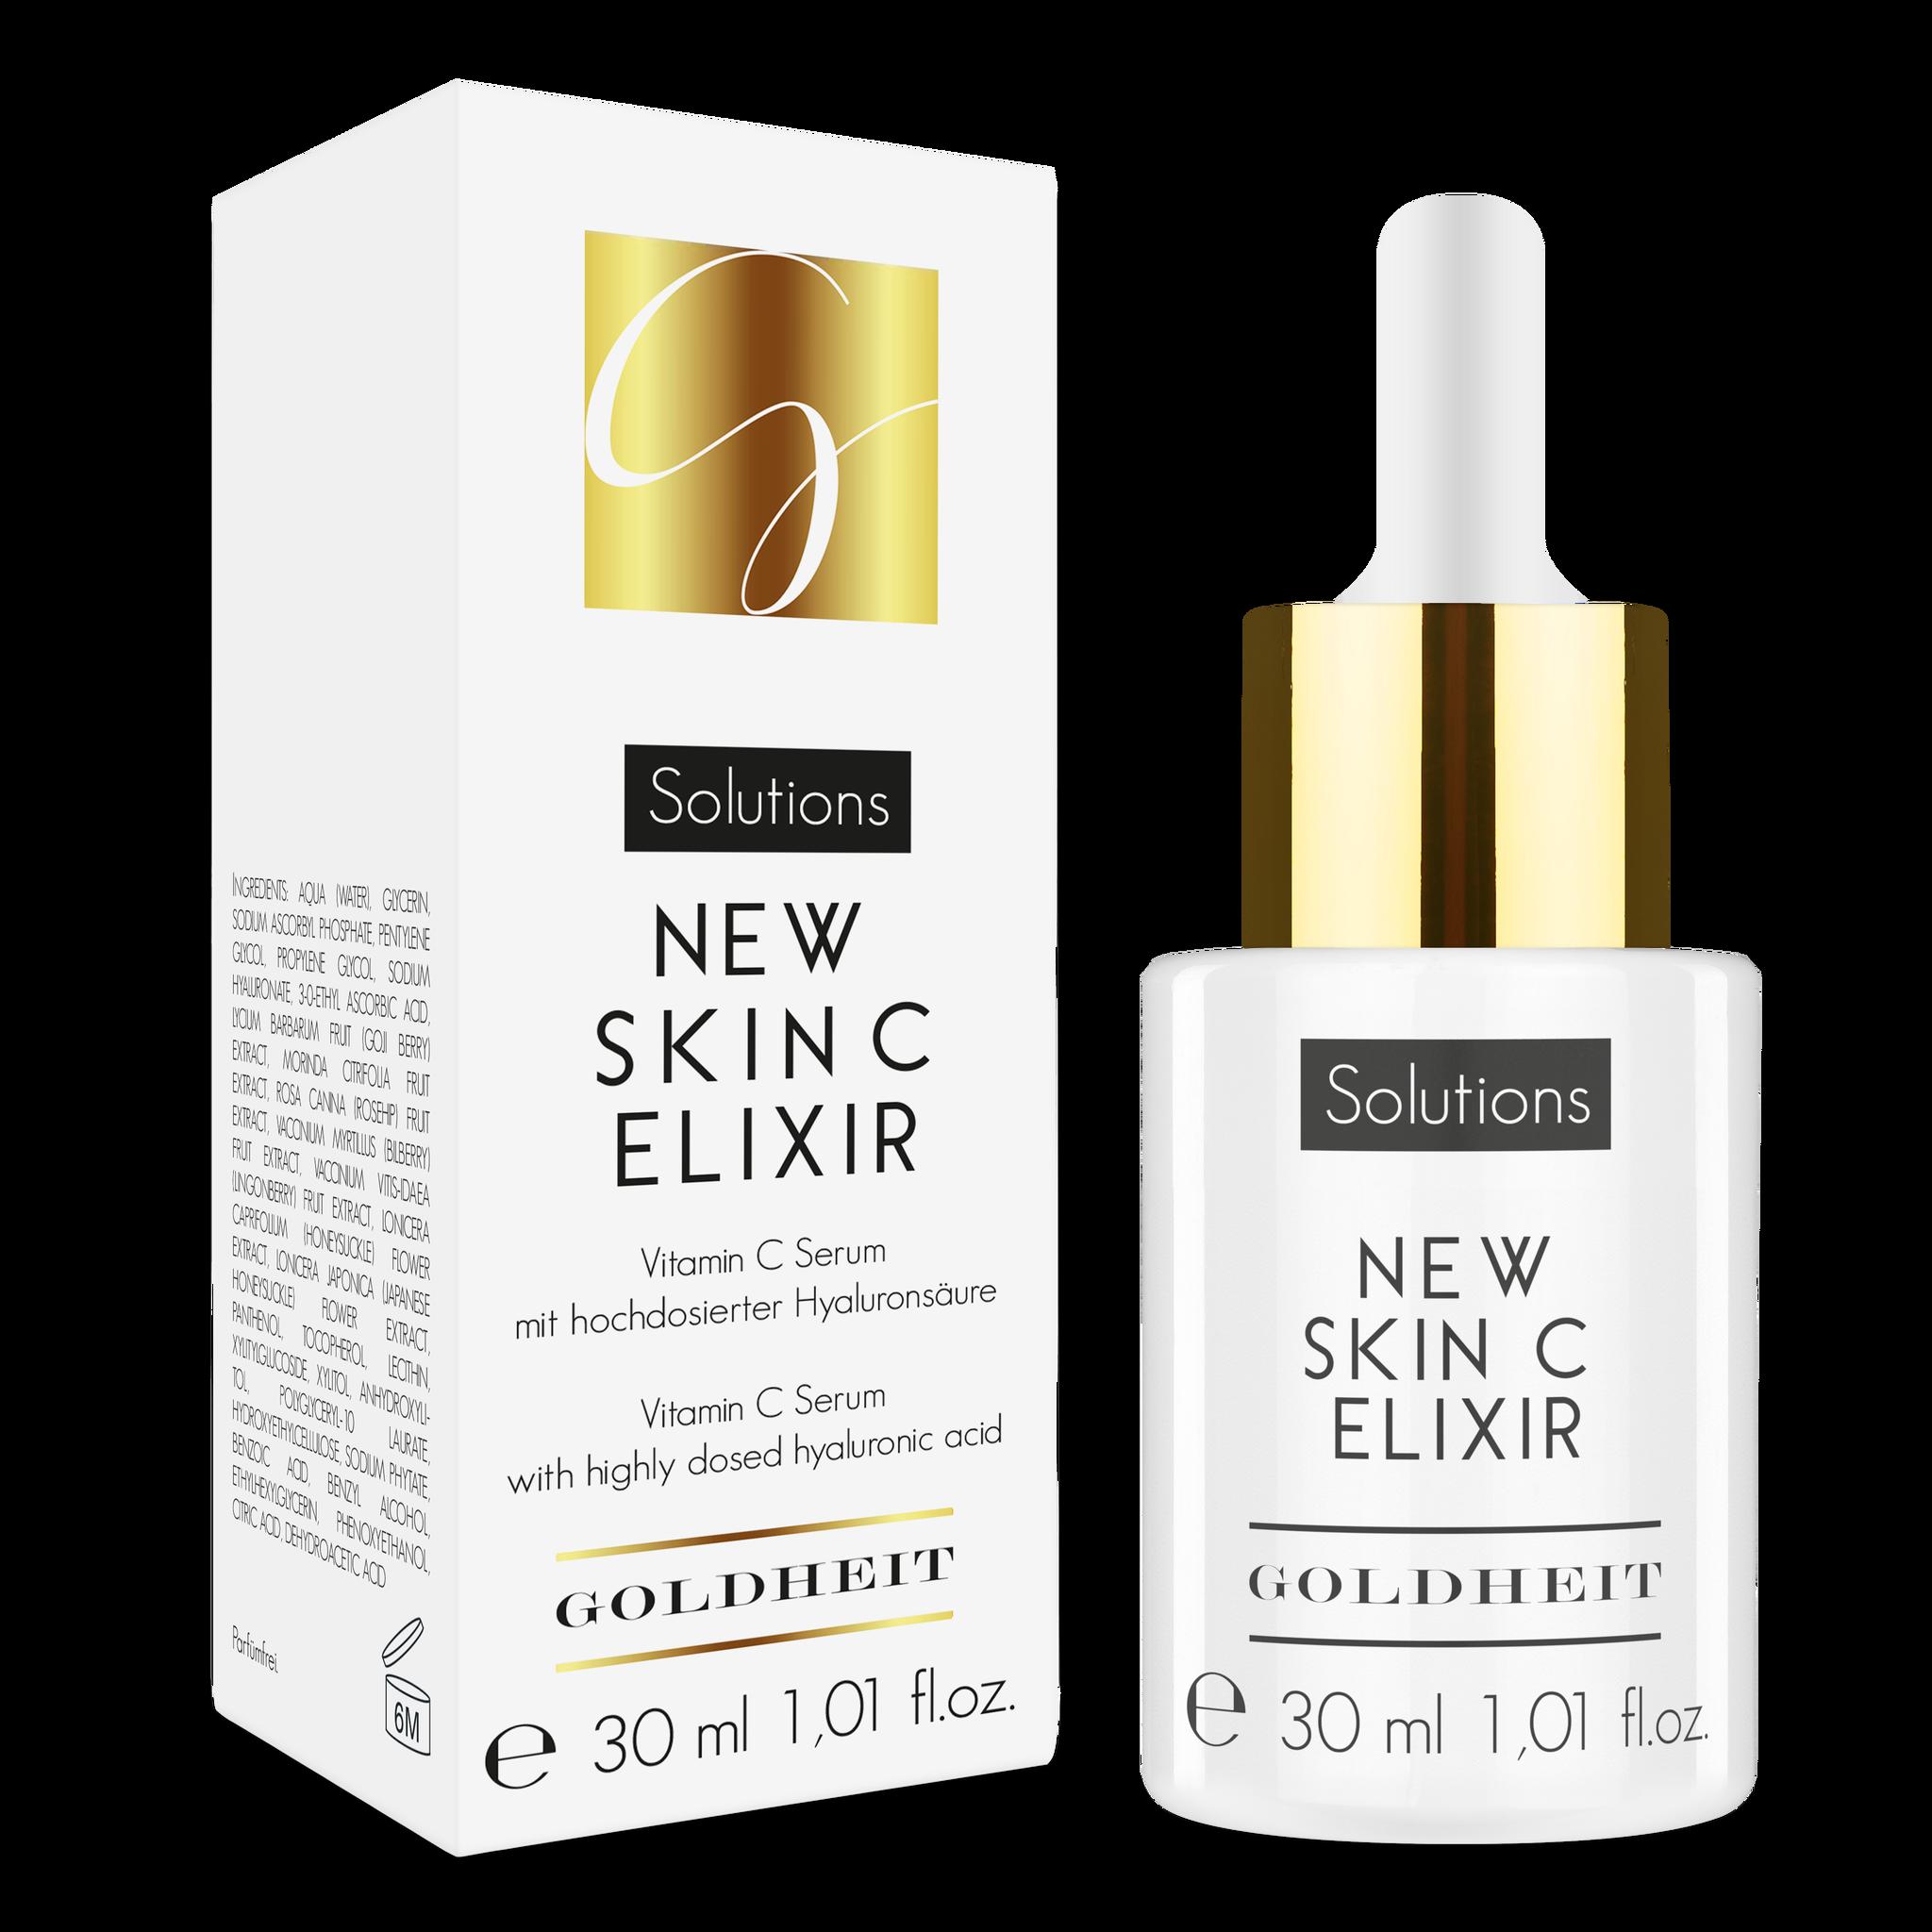 New Skin C Elixir 30 ml